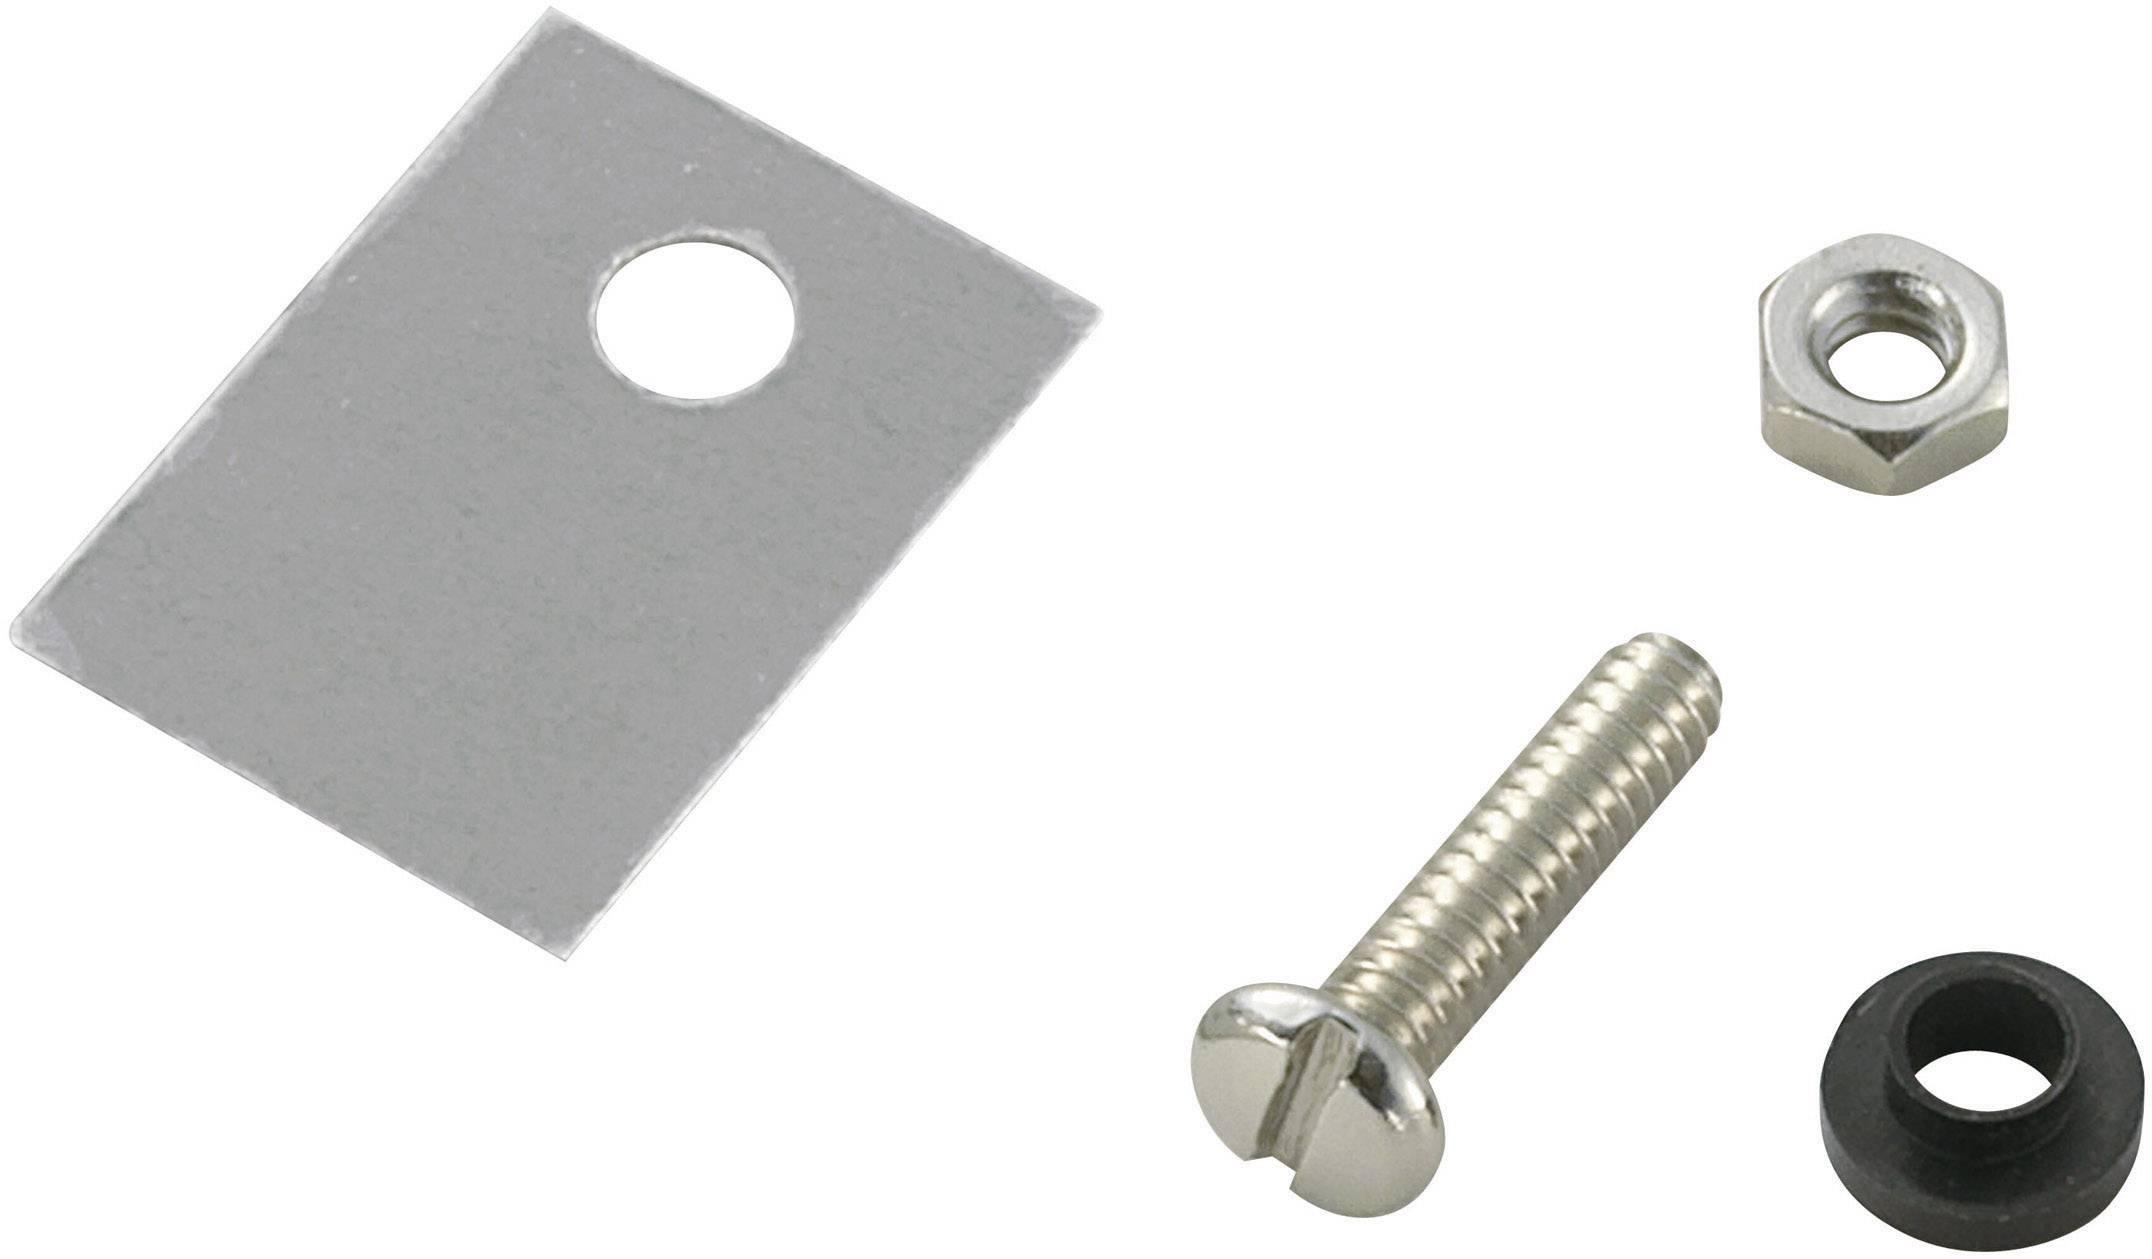 Sada montážního materiálu pro polovodiče TRU COMPONENTS TC-A18-9B, (d x š) 18 mm x 13 mm, 1 sada